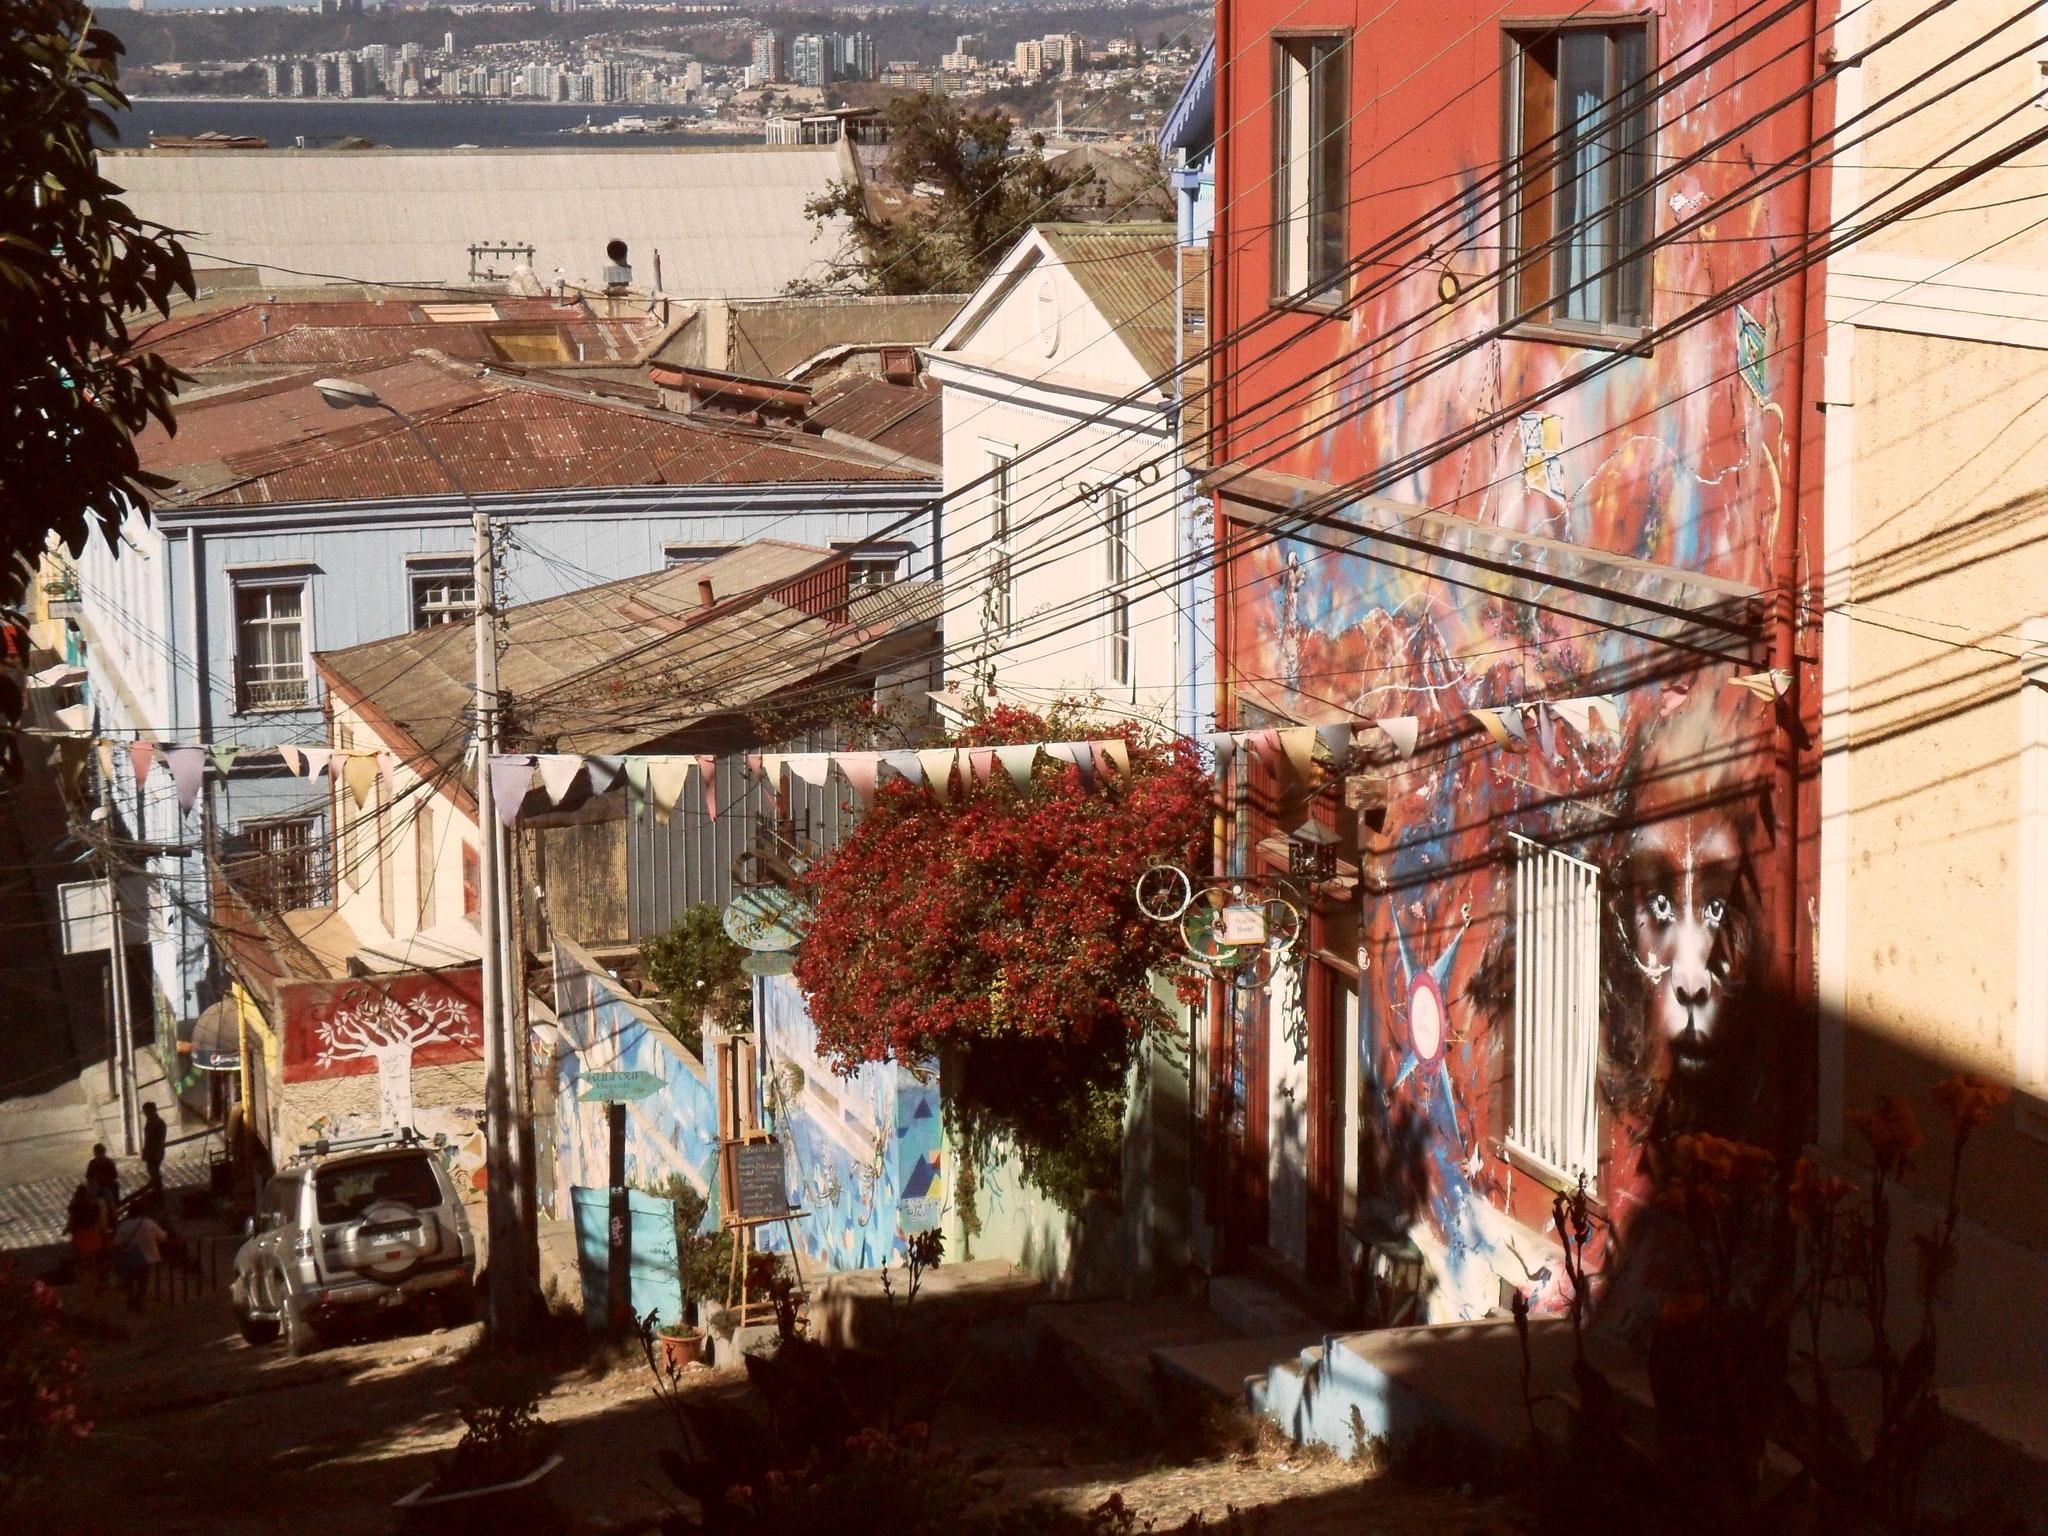 Straßenszene in Valparaiso, Chile ©SarahBrandl